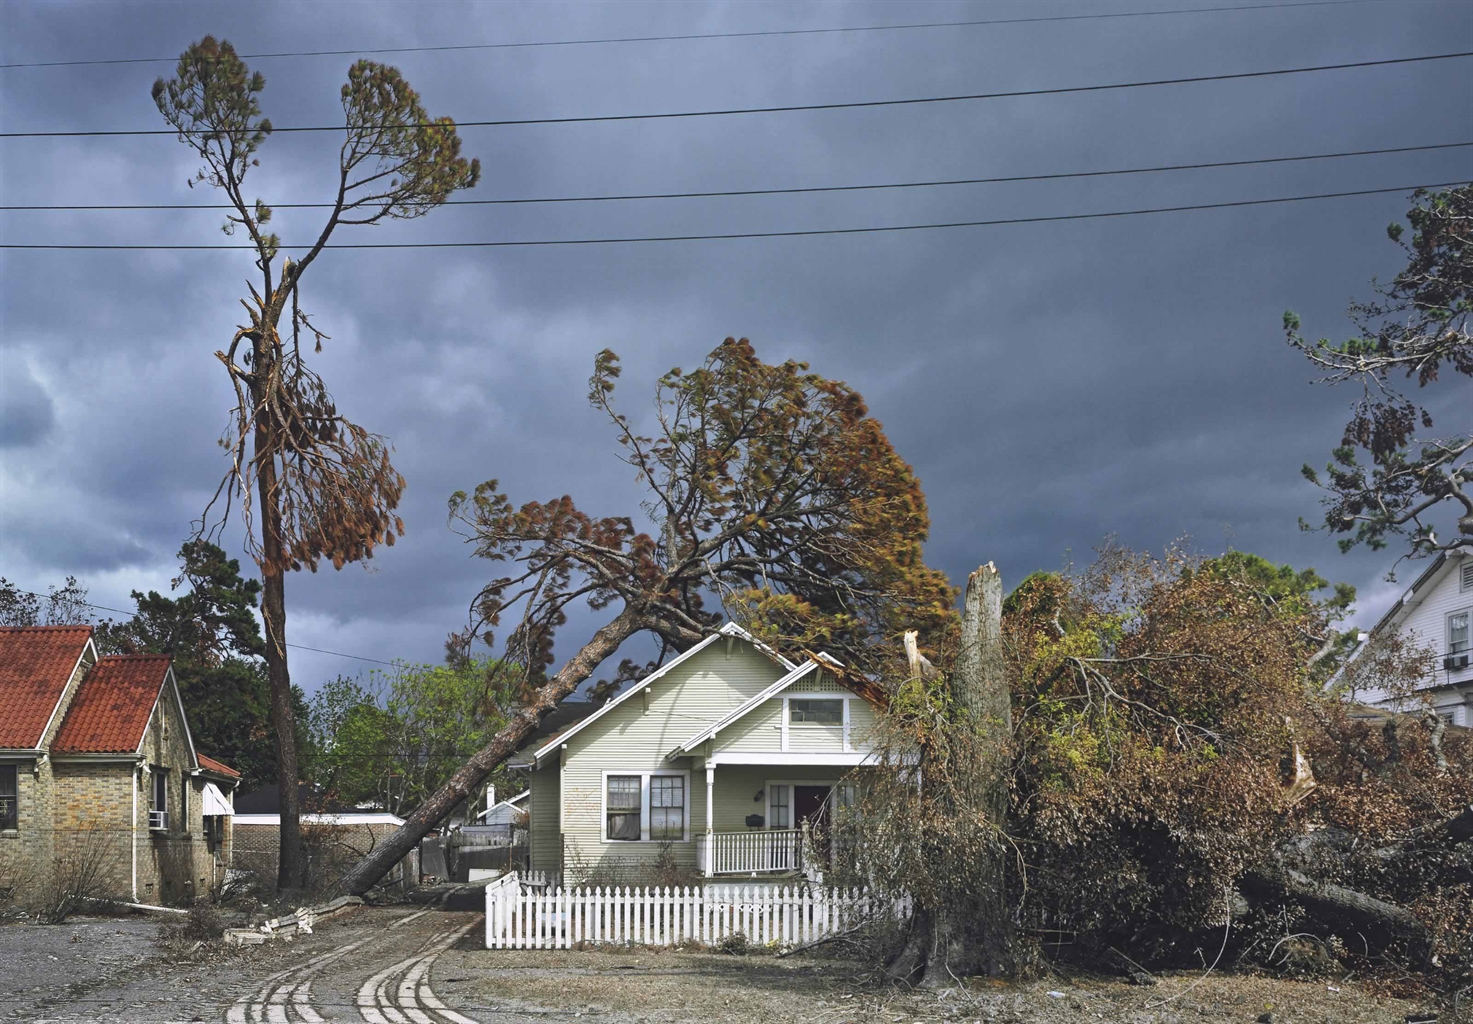 Robert Polidori-5979 West End Boulevard, New Orleans, La-2005